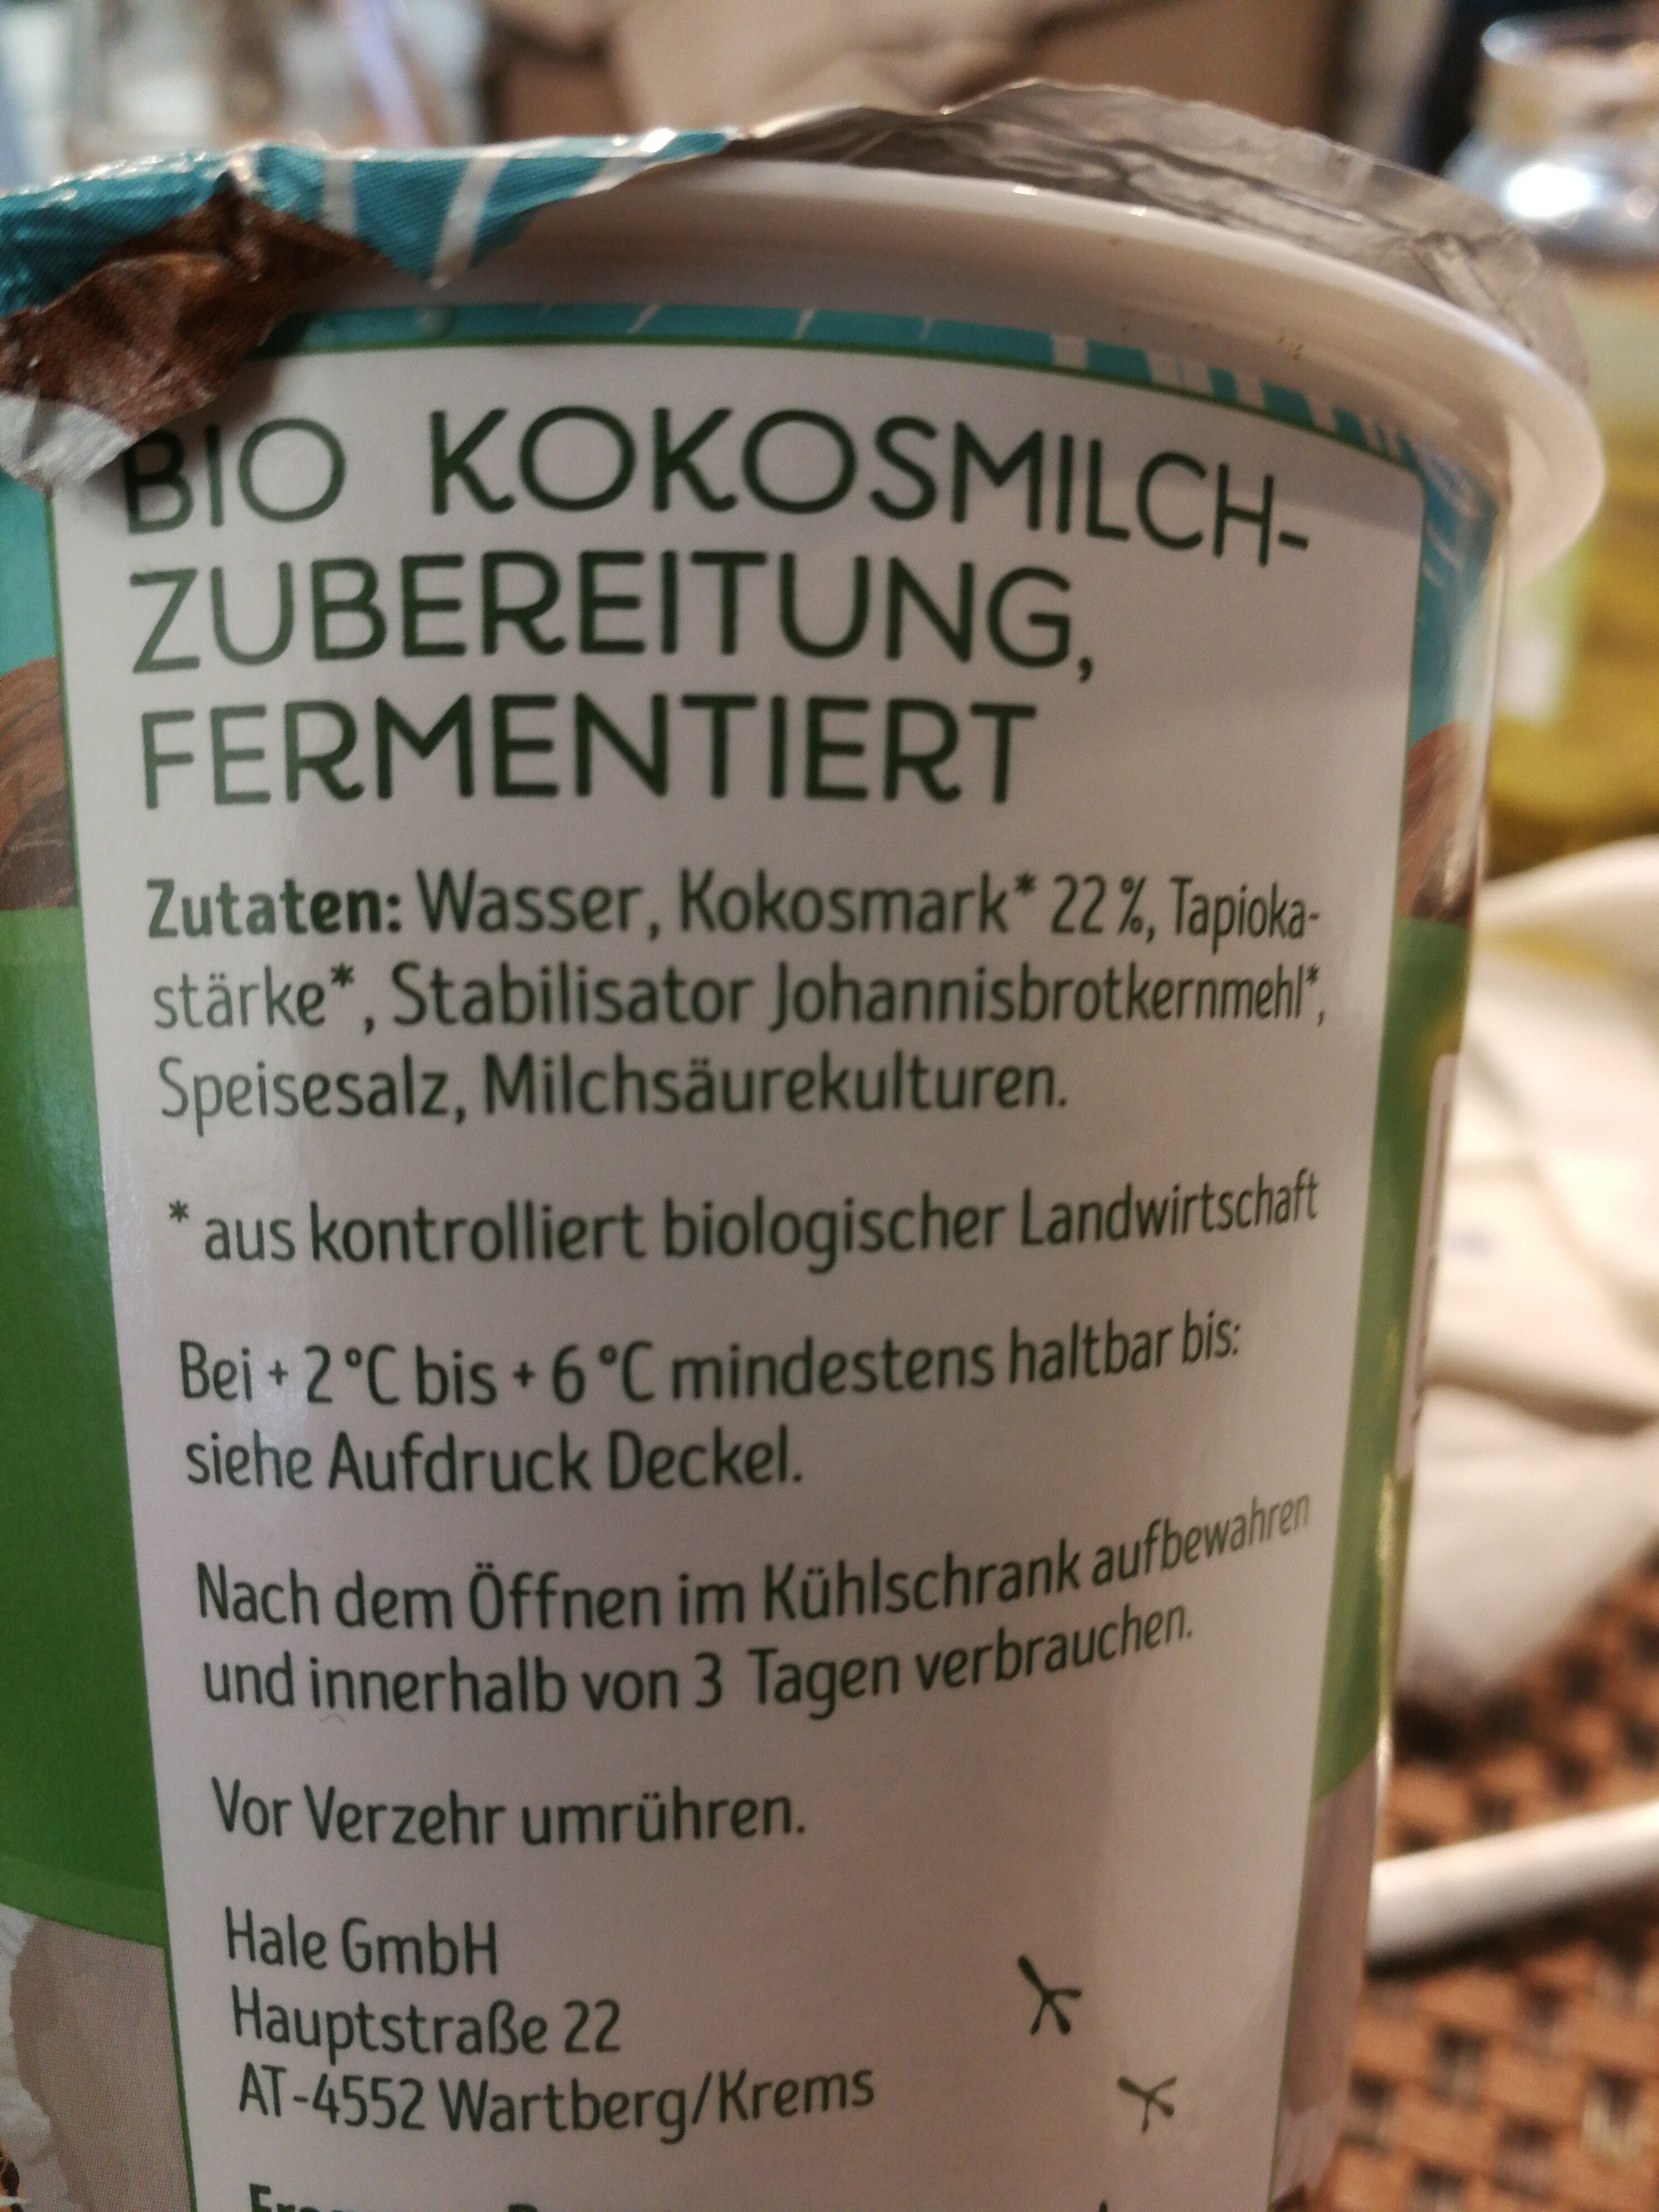 Bio Kokosmilchzubeteitung, fermentiert - Zutaten - de